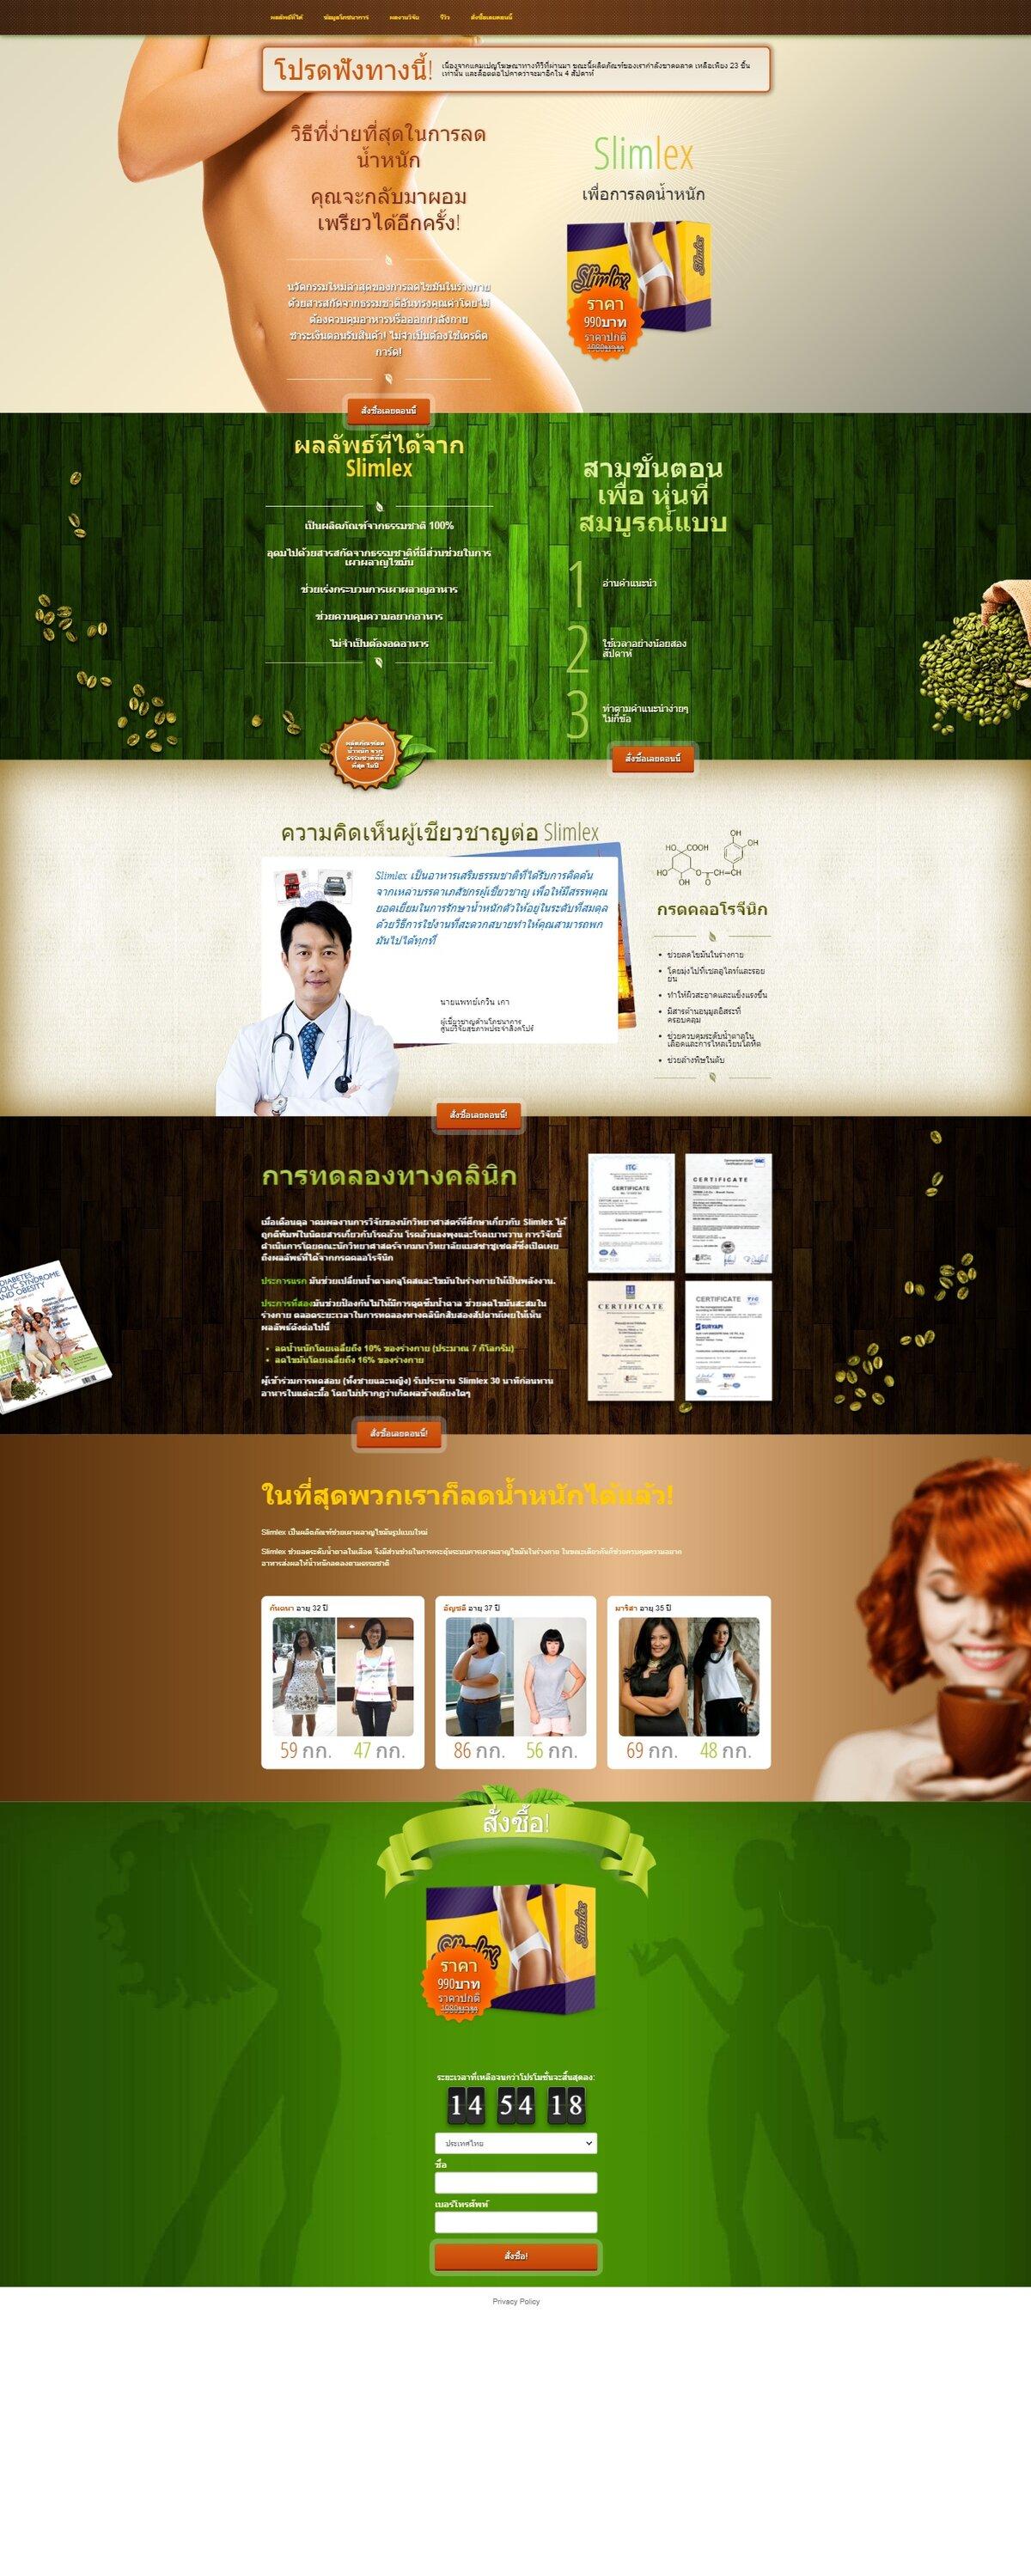 Slimlex капсулы похудения th таиланд http://c. Twnt. Ru/sdeb.